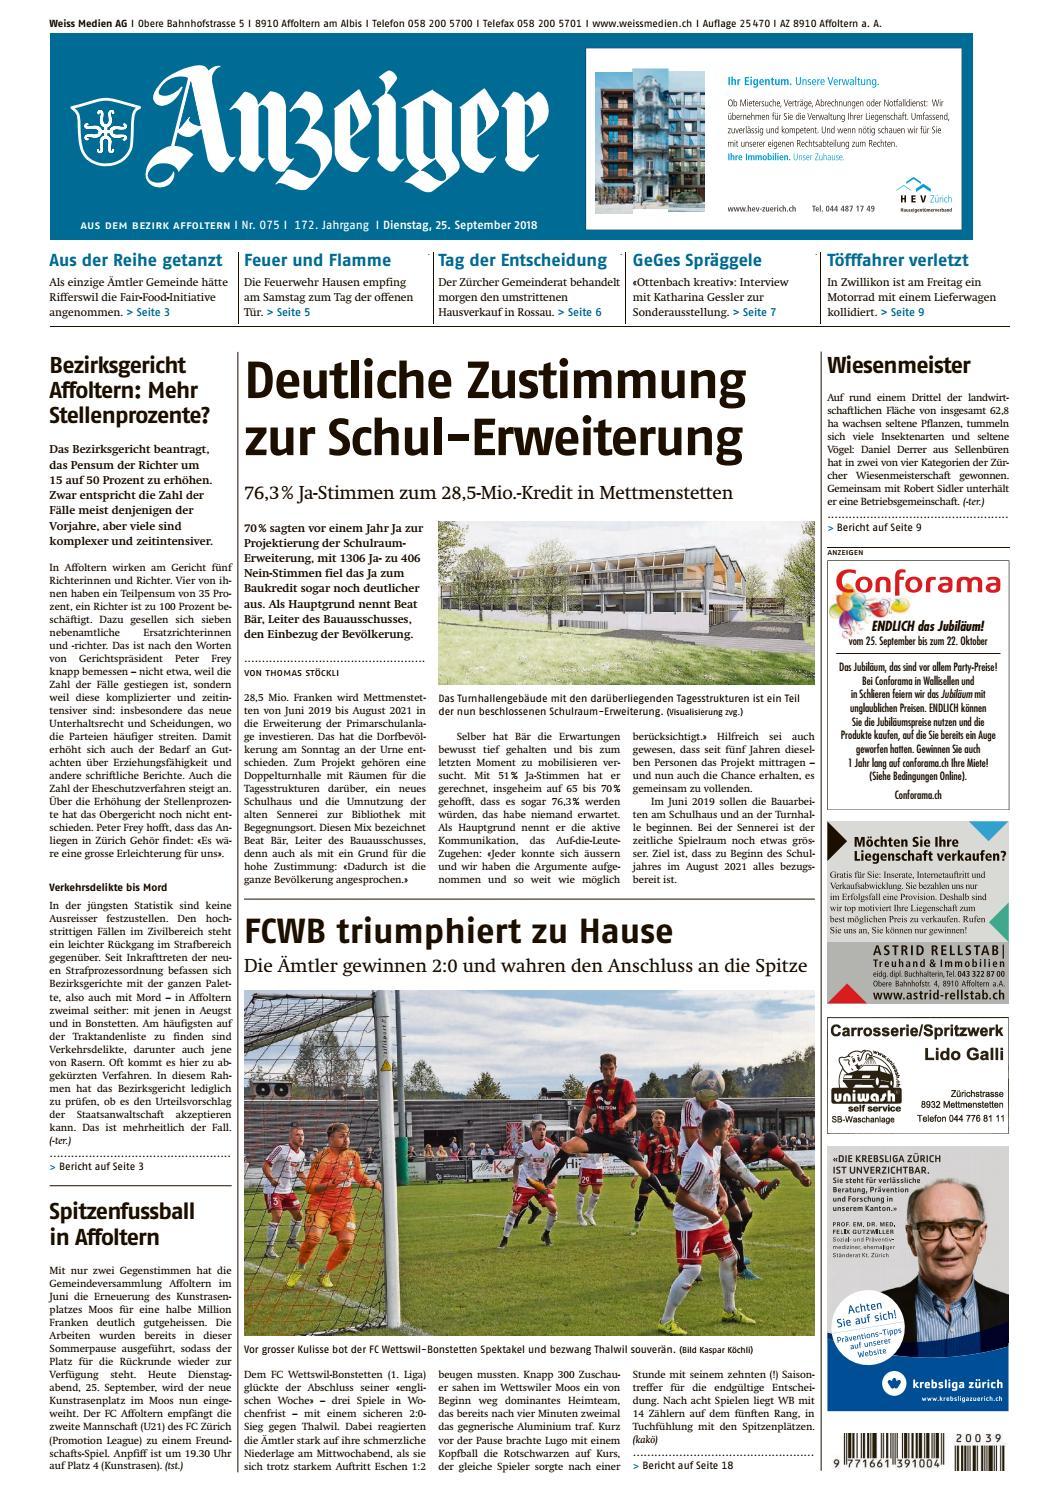 Woche-Pass | KW11 | 14. Mrz 2012 by Woche-Pass AG - issuu